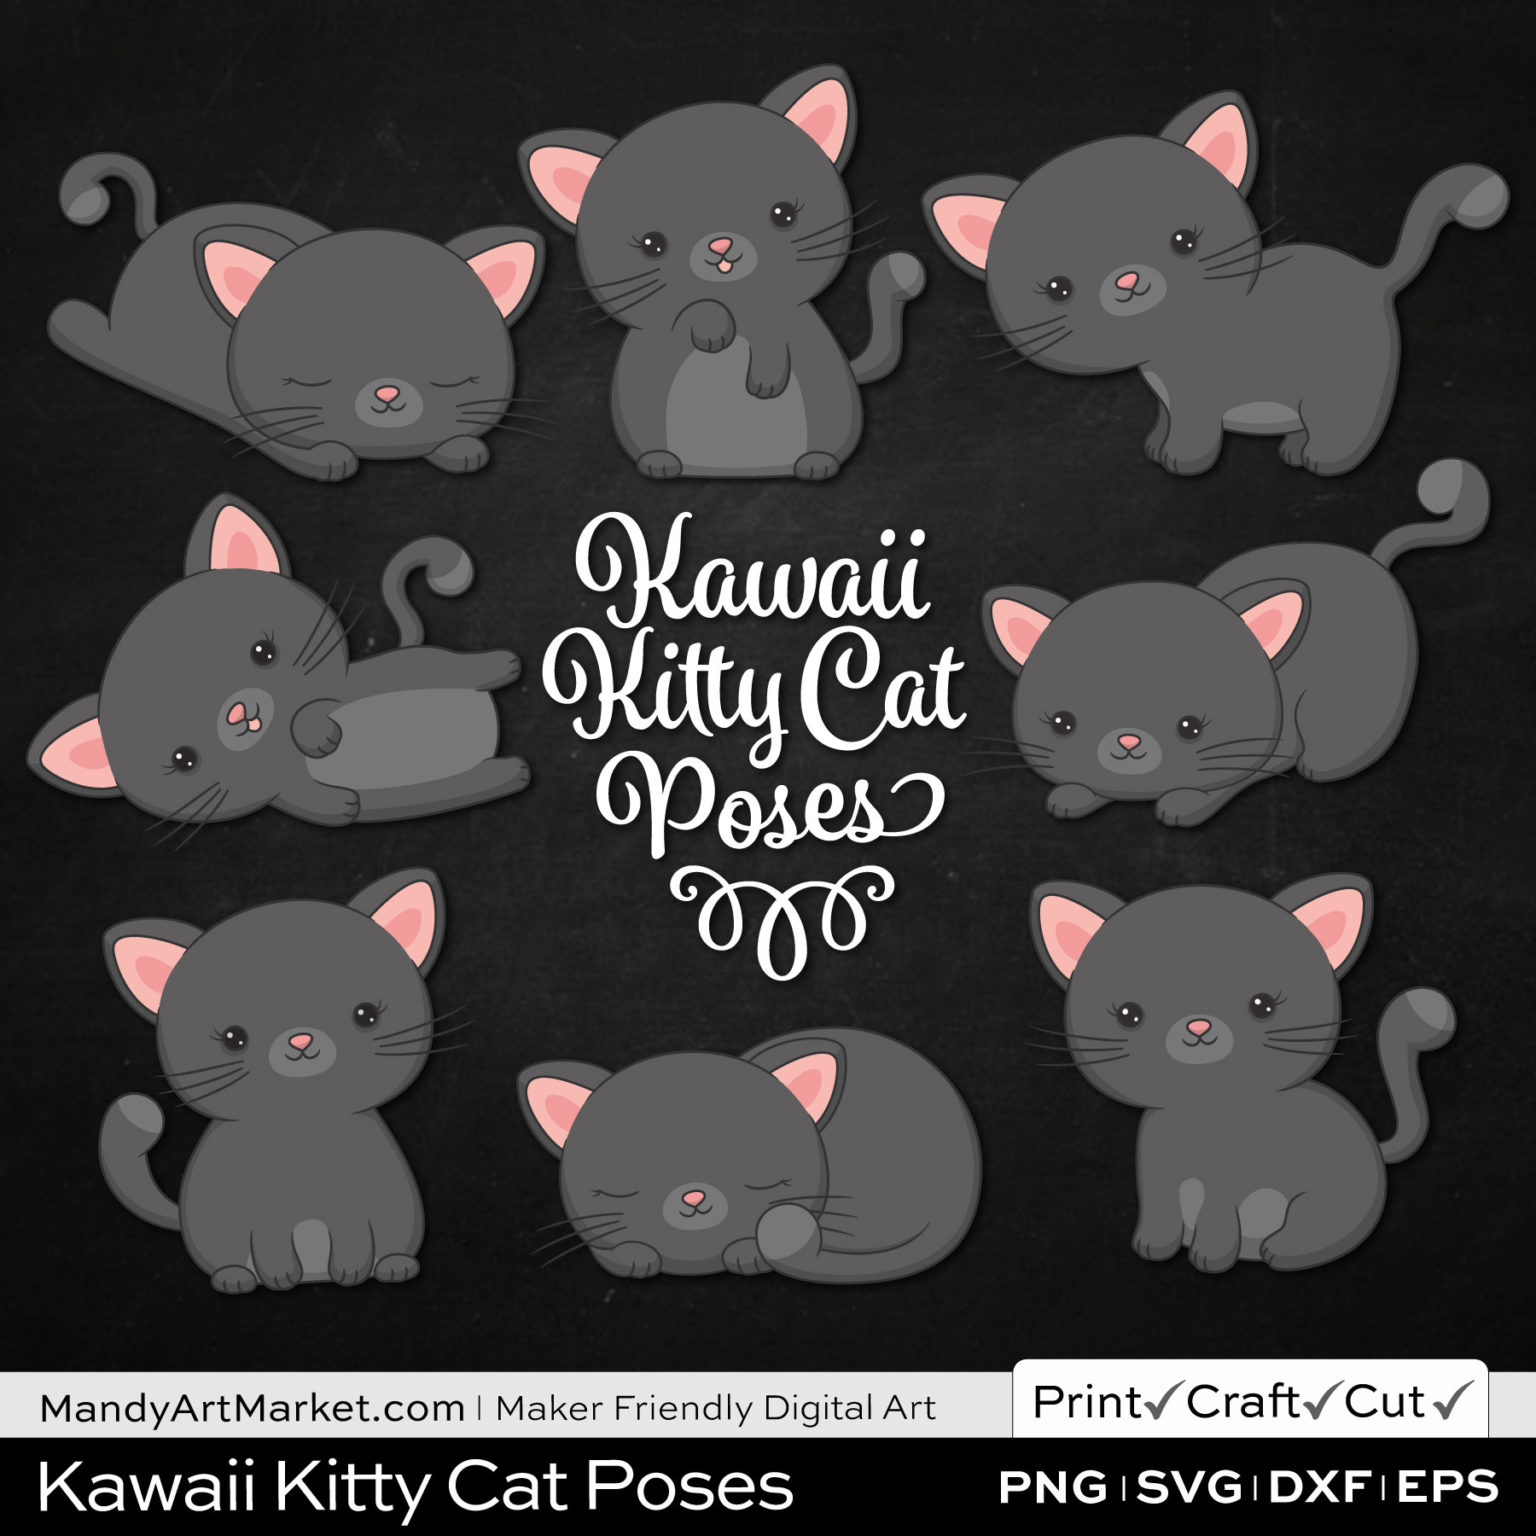 Shadow Gray Kawaii Kitty Cat Poses Clipart on Black Background